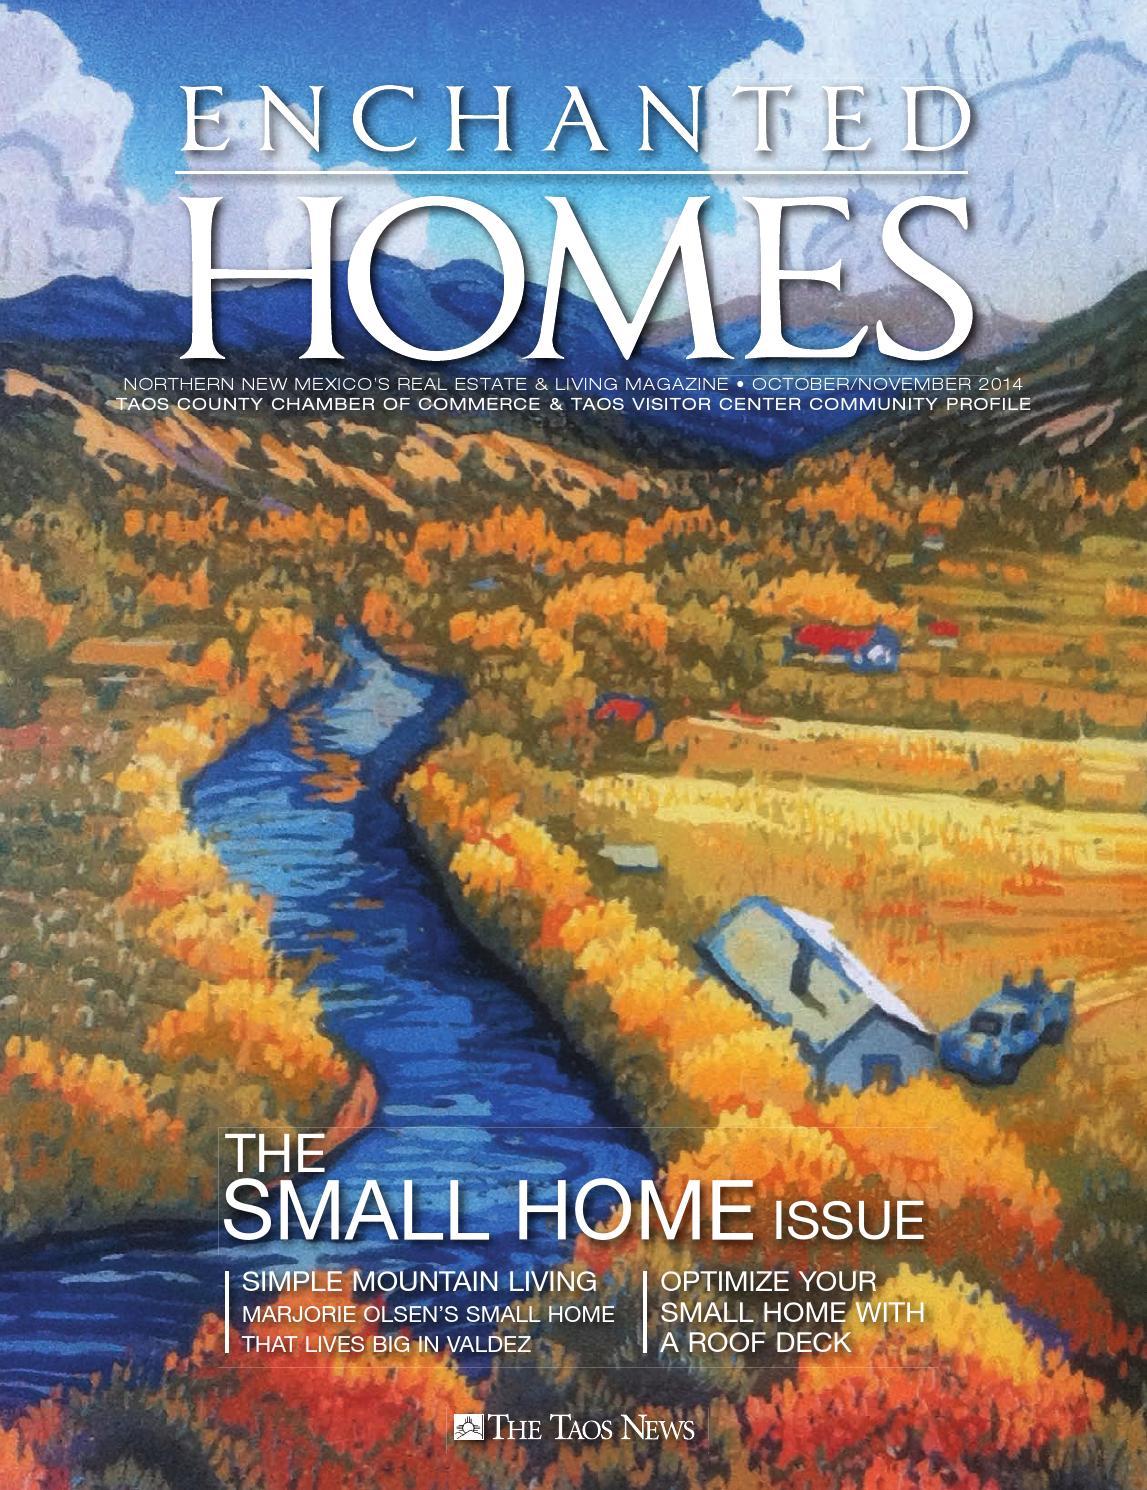 Enchanted Homes OctoberNovember 2014 by The